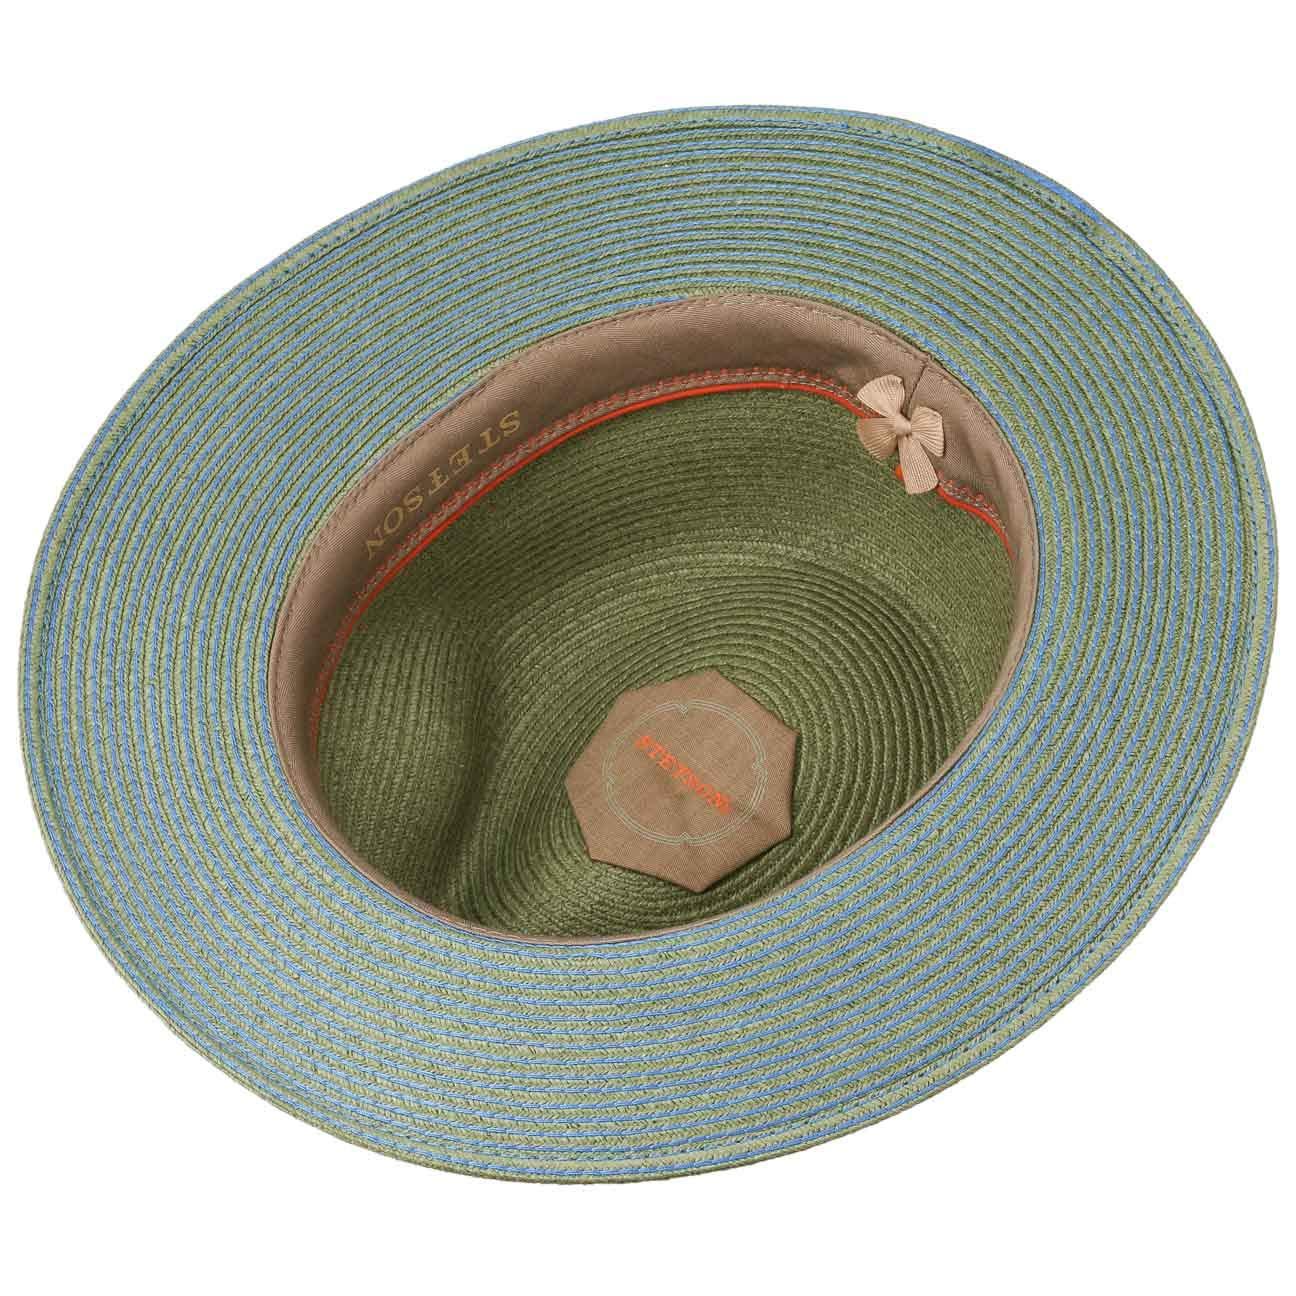 de Paja Sol con Banda Grosgrain Primavera//Verano Stetson Sombrero Monticello Toyo Hombre